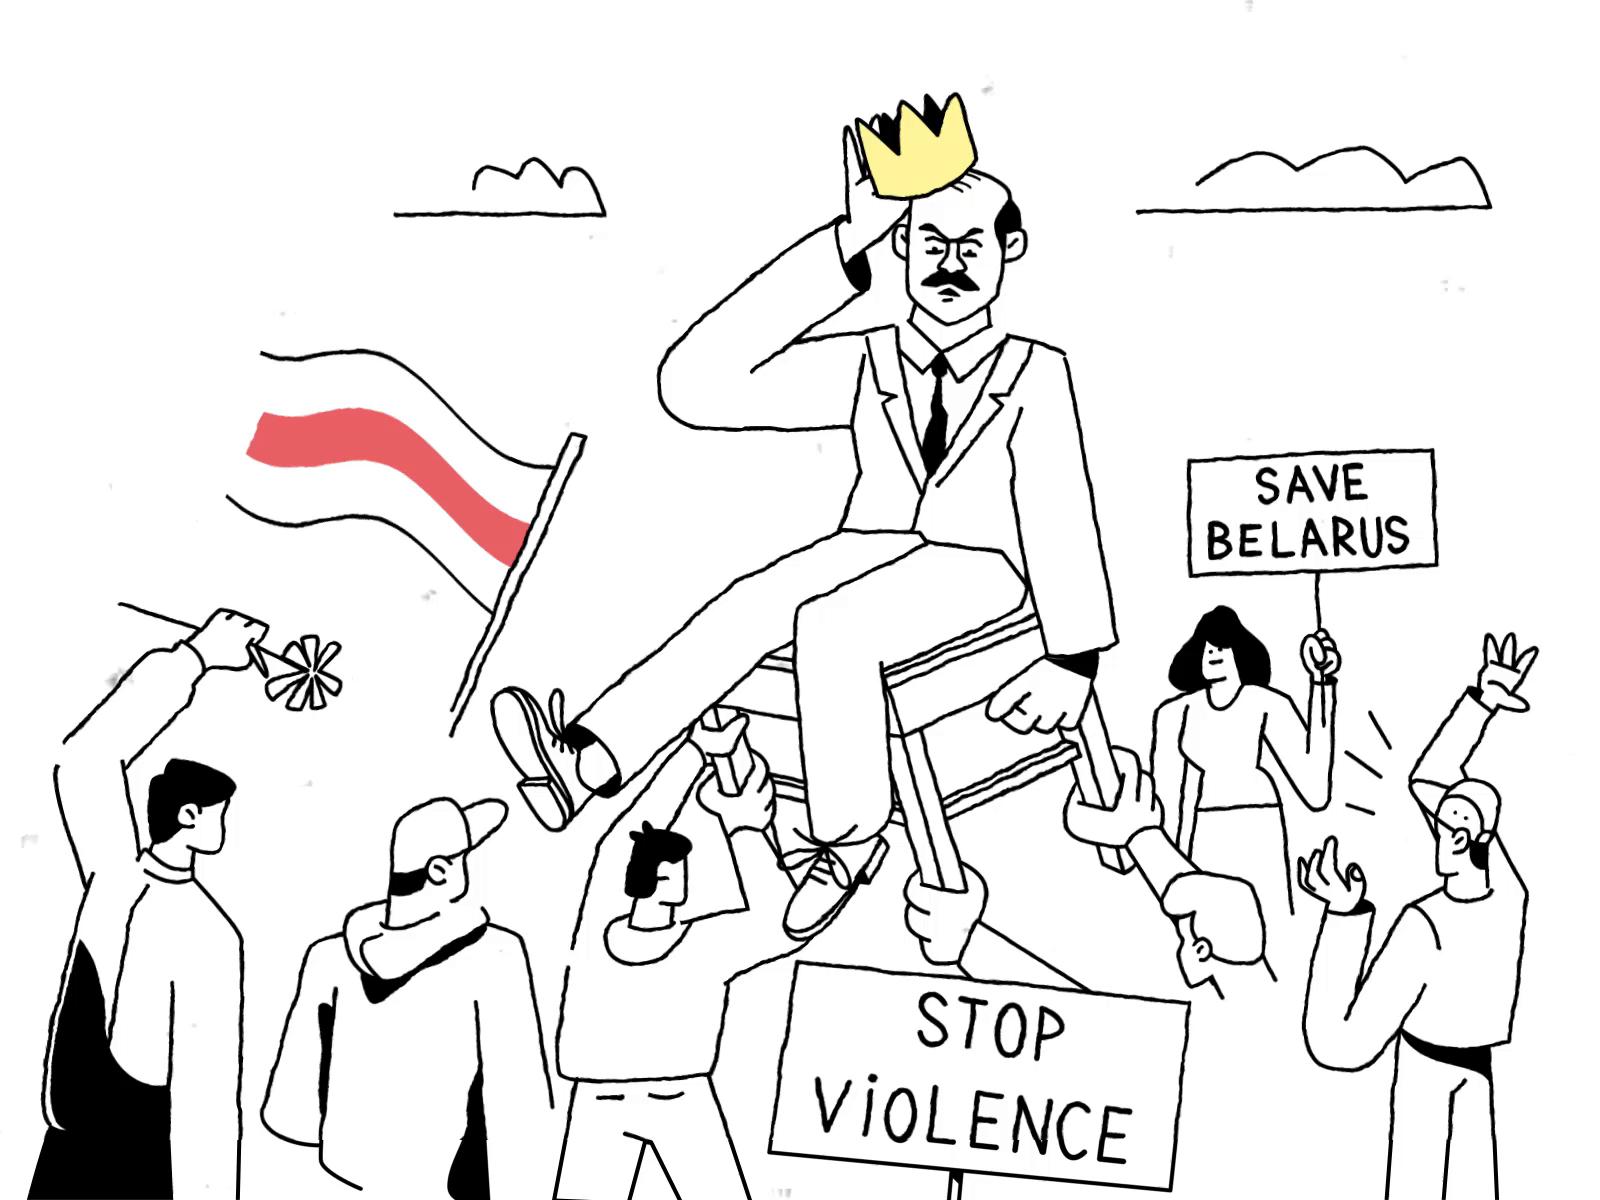 Go Away Save Belarus By Oleh Harlamov 2020 Animated Illustration Belarus Character Democracy Demonstr Digital Illustration Illustration Cancer Patients